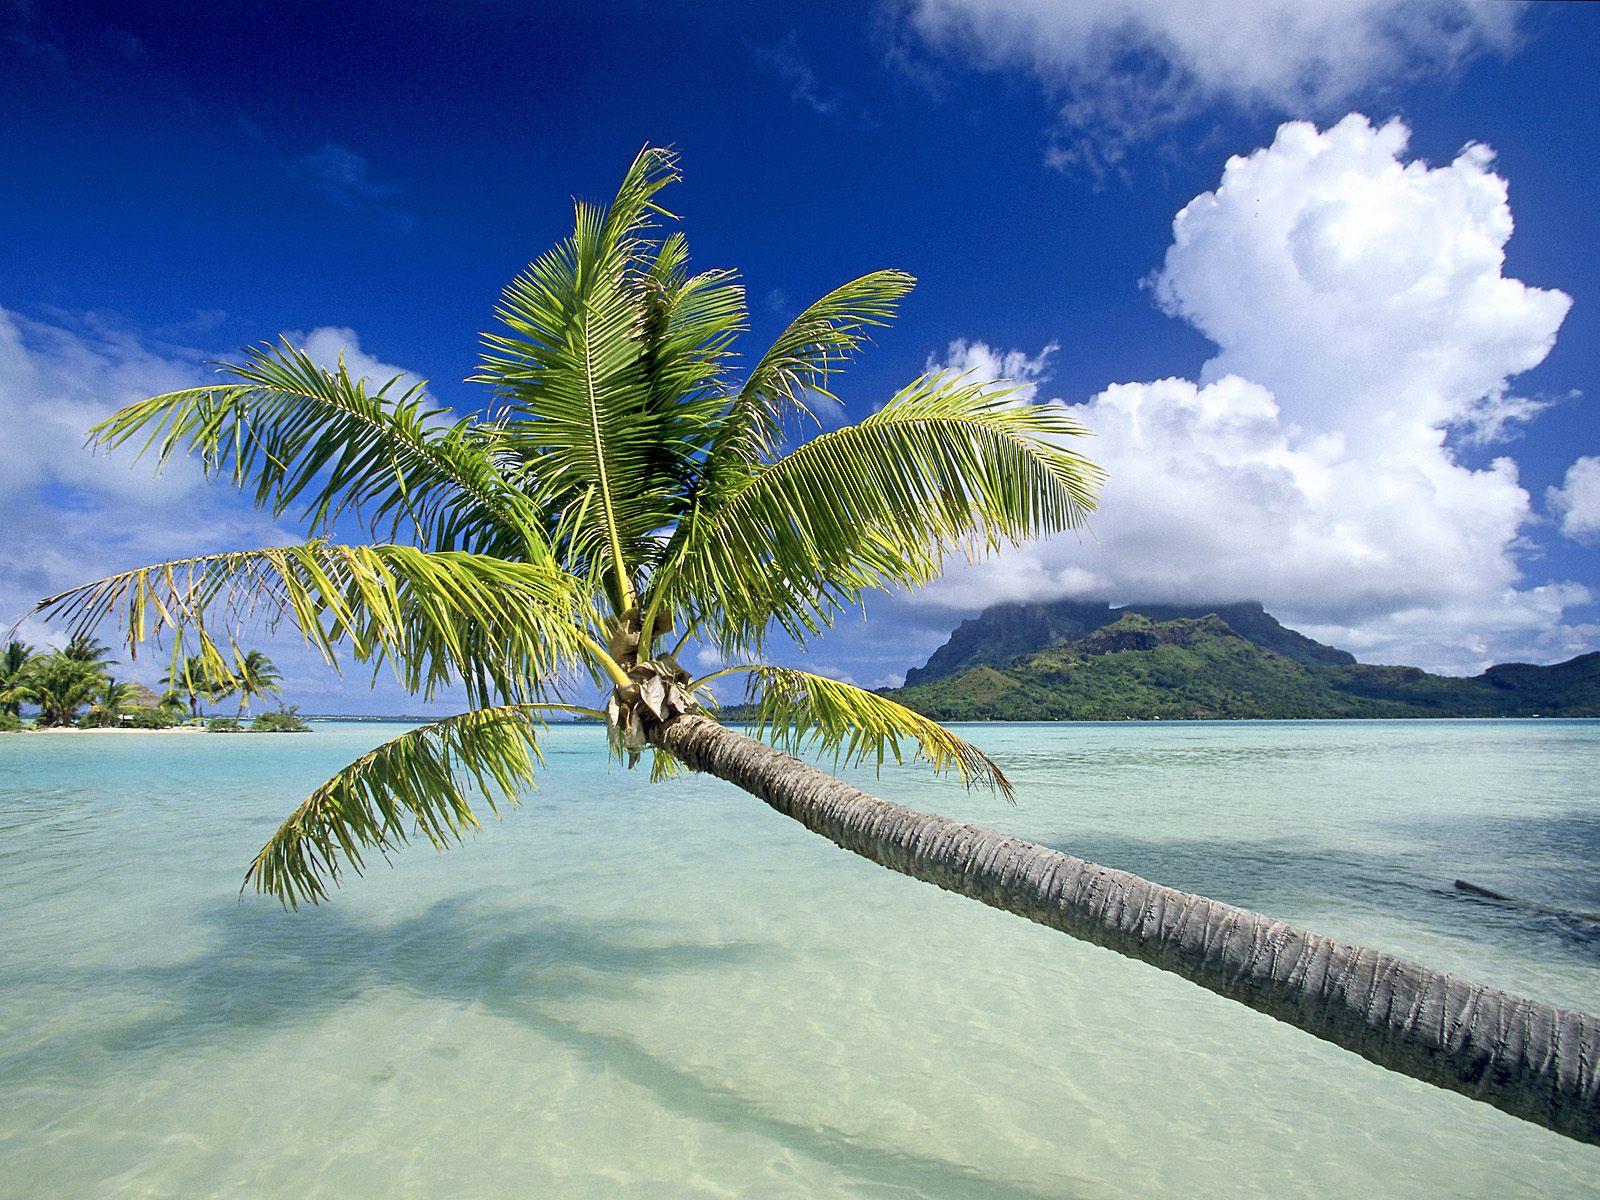 Beautiful Beach Wallpapers: World Visits: Tropical Island Beach Wallpaper Free Review